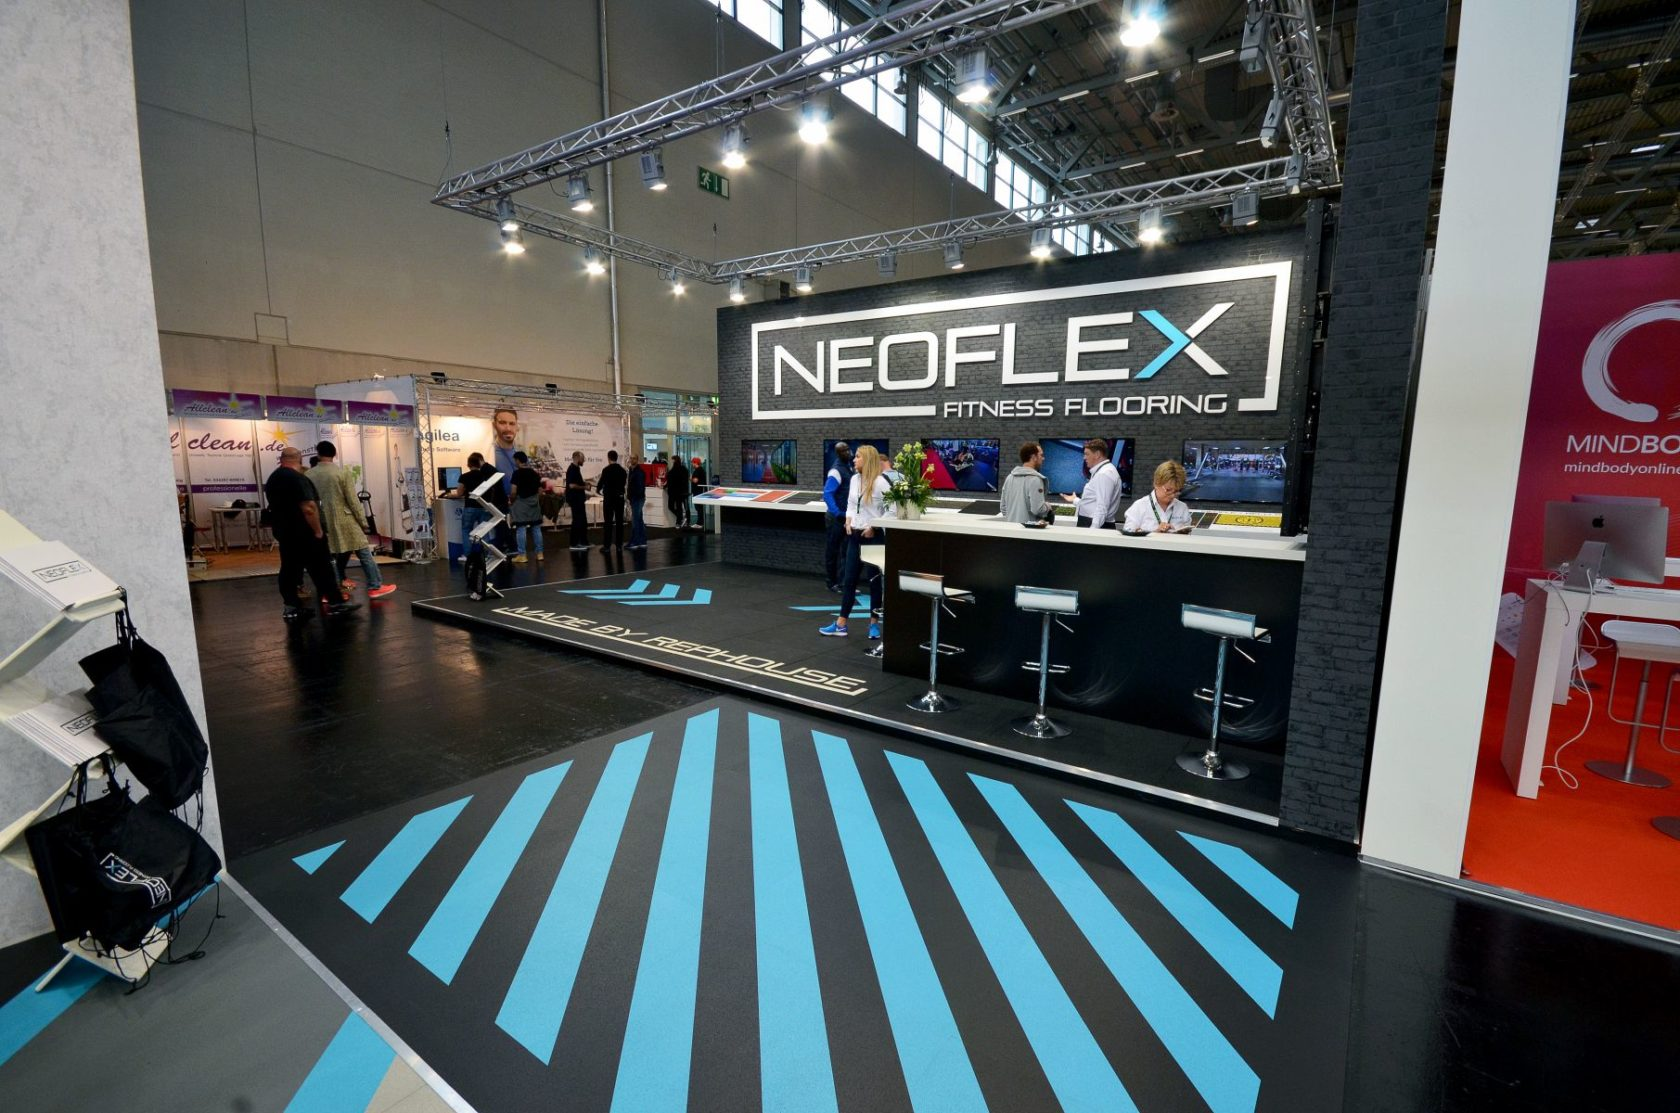 messebau-siehr-fibo-koeln-messe-neoflex-2